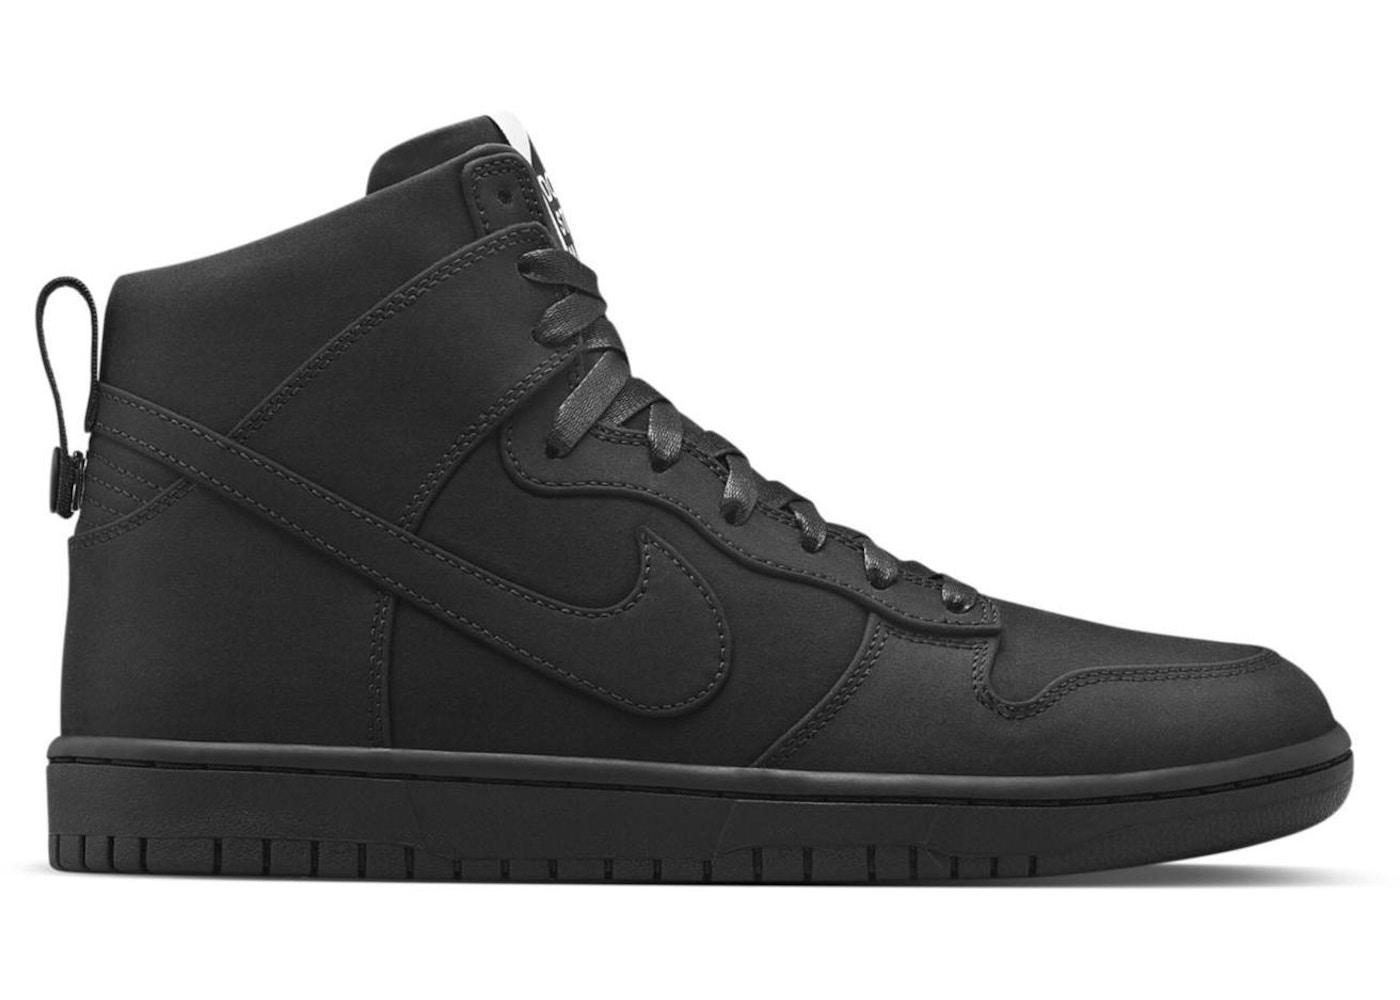 5c670bea1 Nike Dunk High Dover Street Market Black - 718766-001